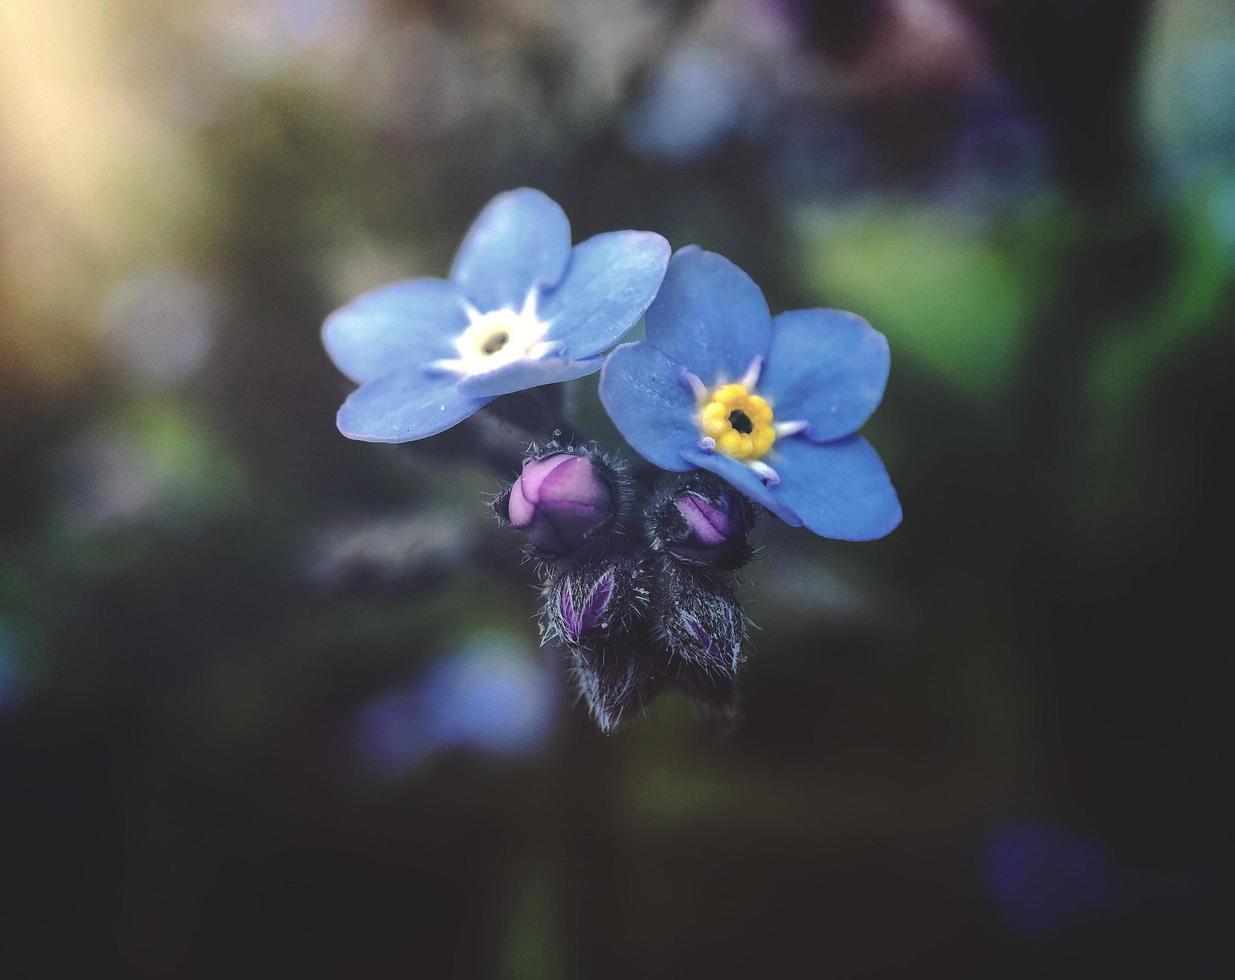 blå kronblad blommor upplyst av solljus foto